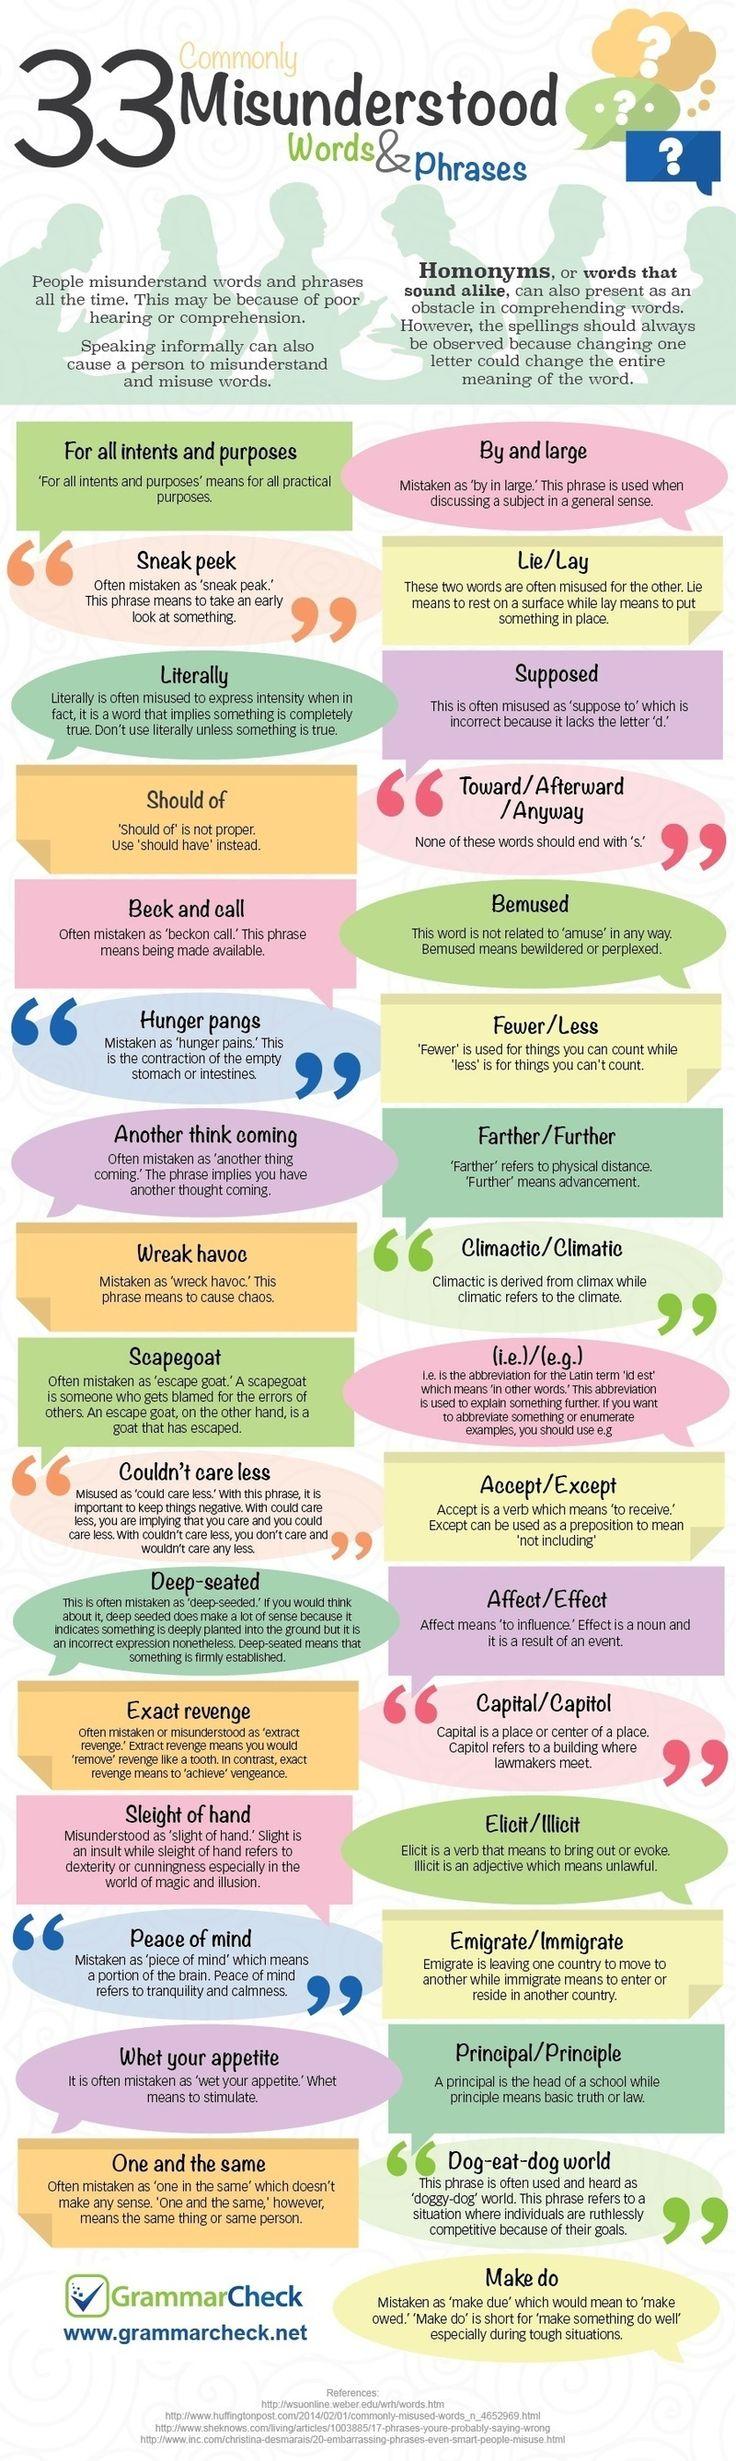 Best 25+ Grammar Check Ideas Only On Pinterest  Check English, Grammar And  Grammar Check English